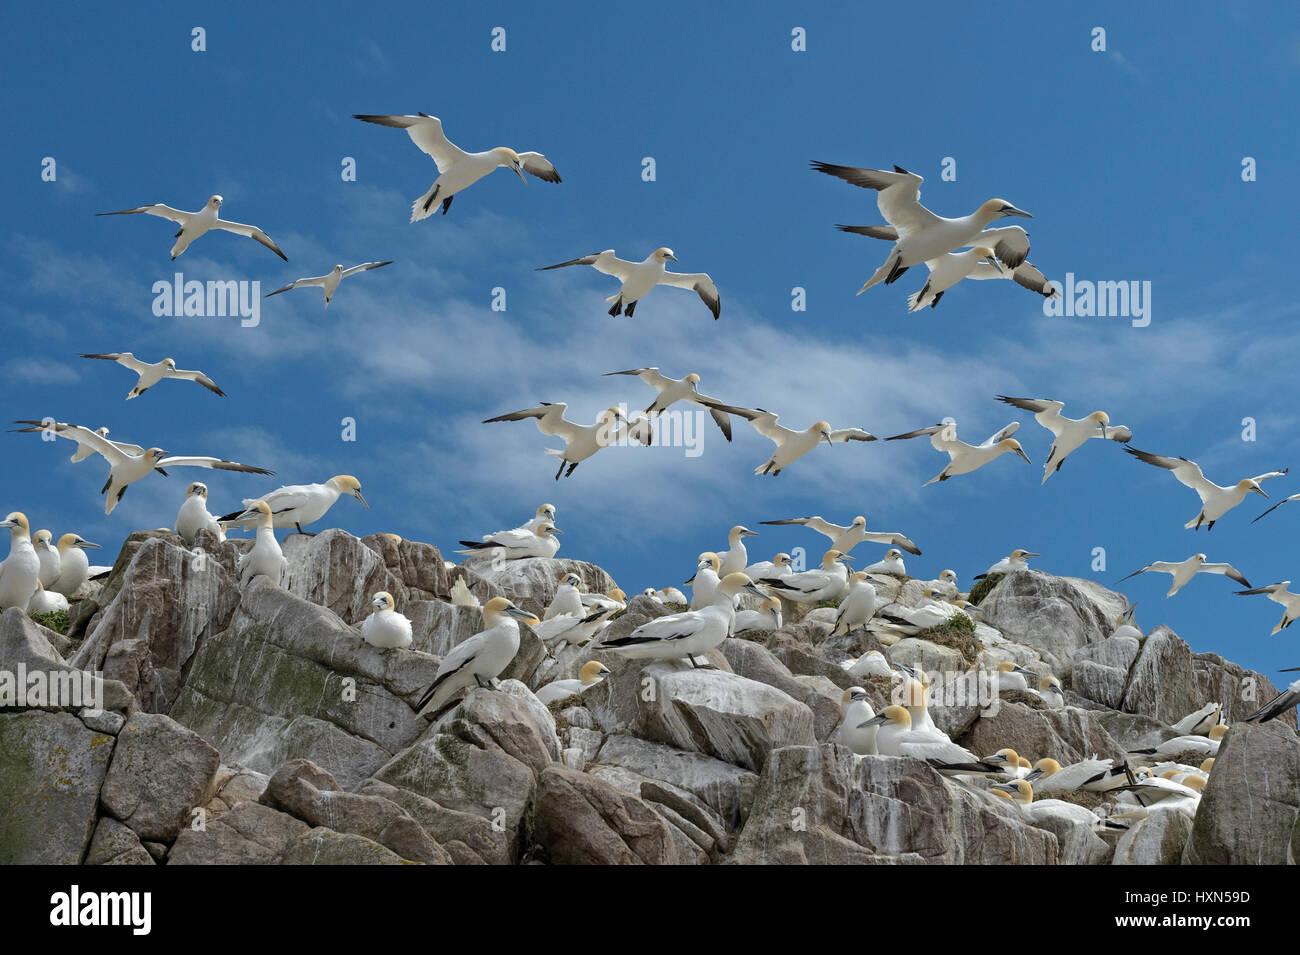 Flock of northern gannets( Morus bassanus) at nesting colony. Great Saltee island, co Wexford, Ireland. April. Stock Photo